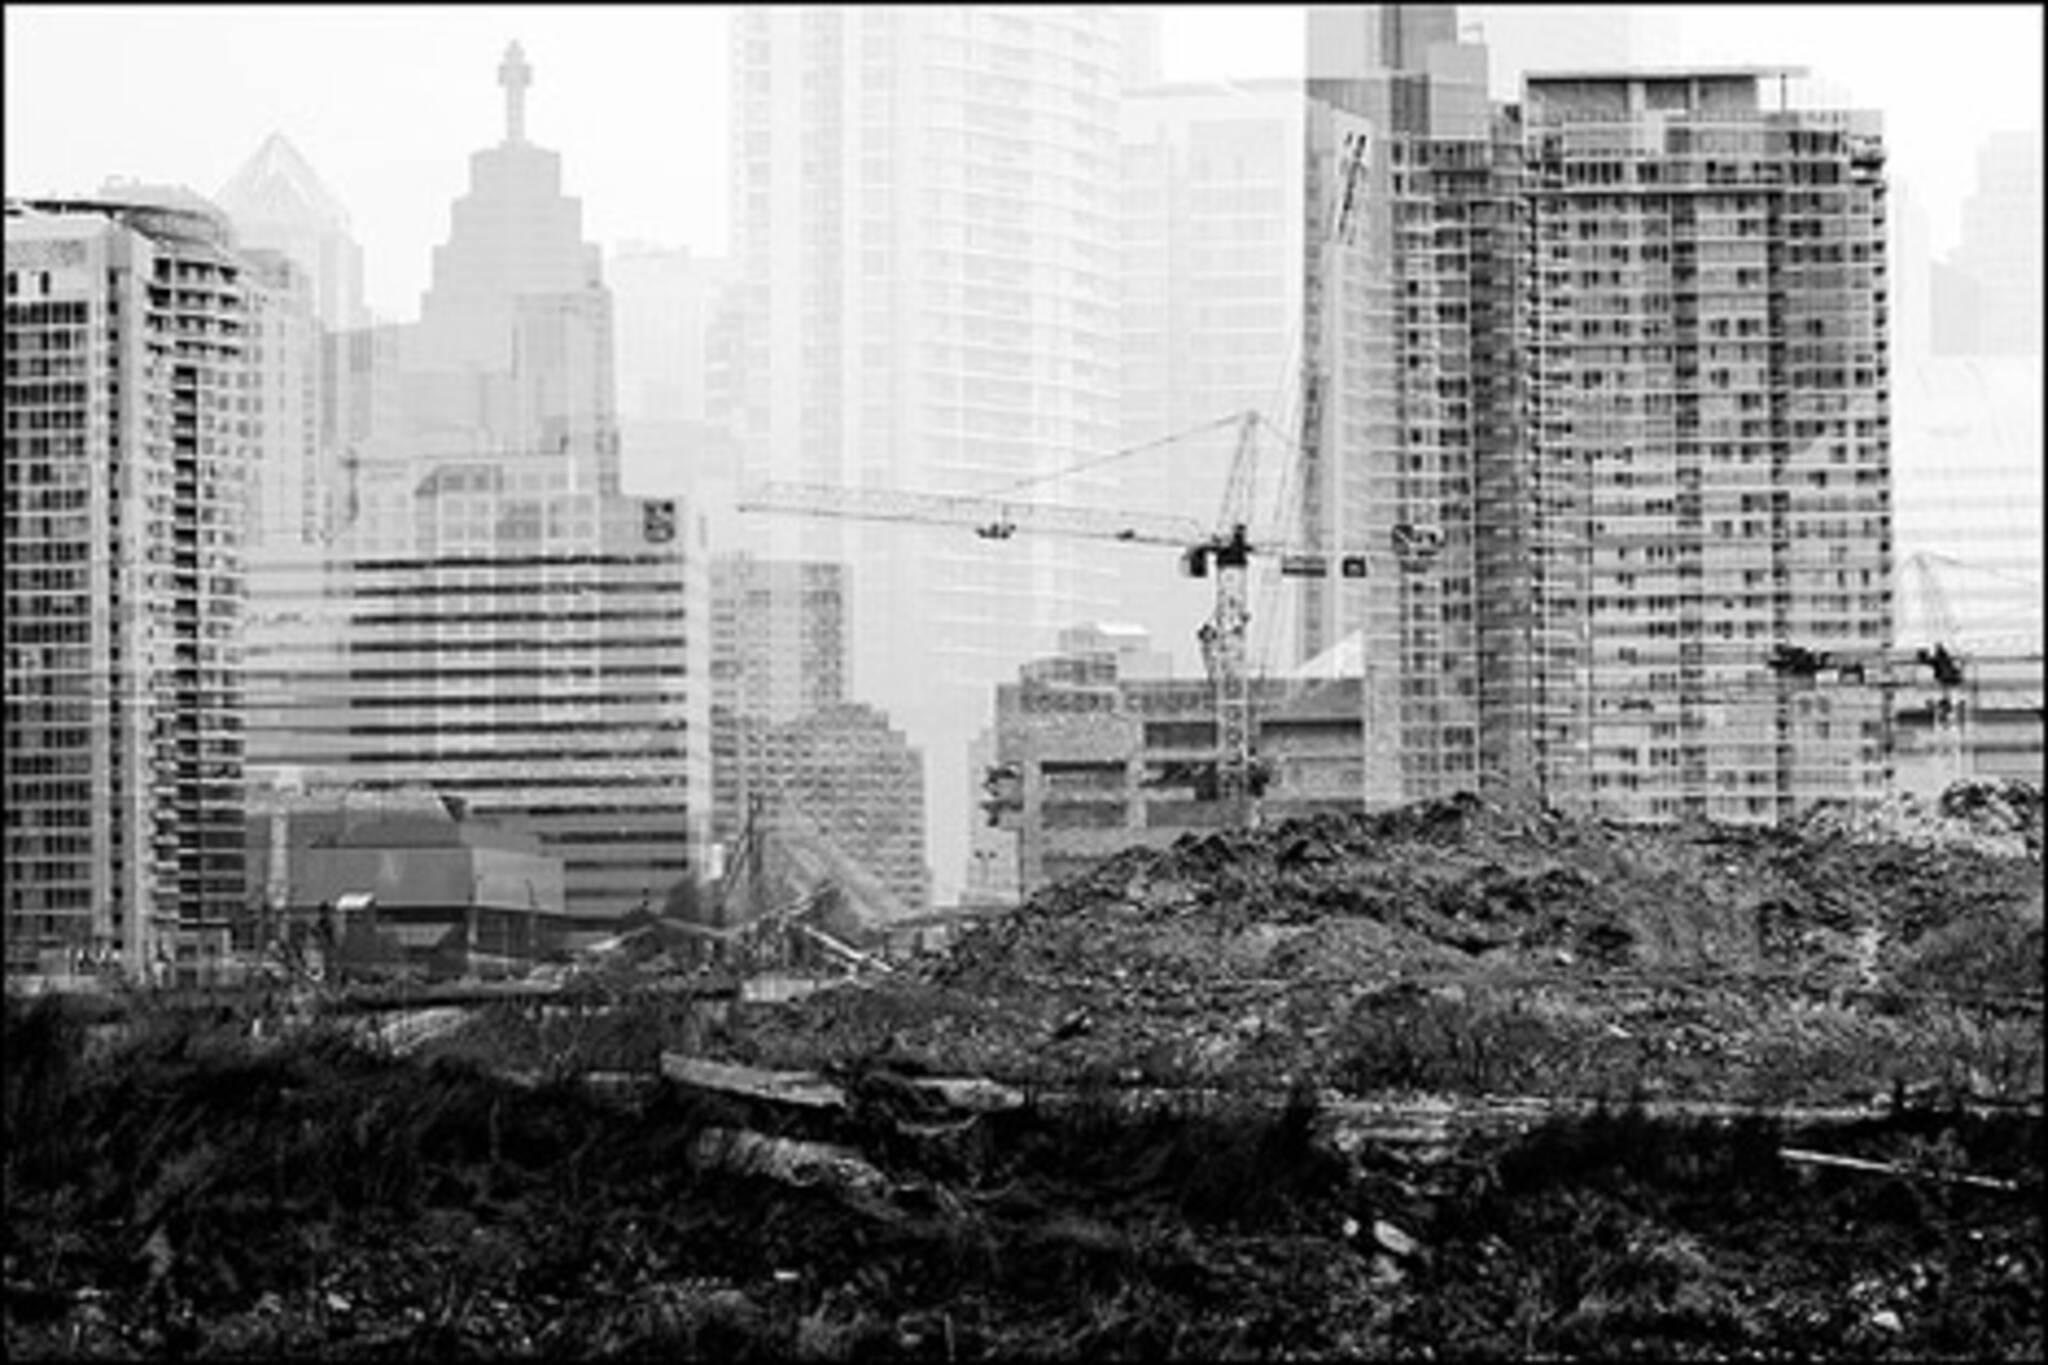 Imaginary City